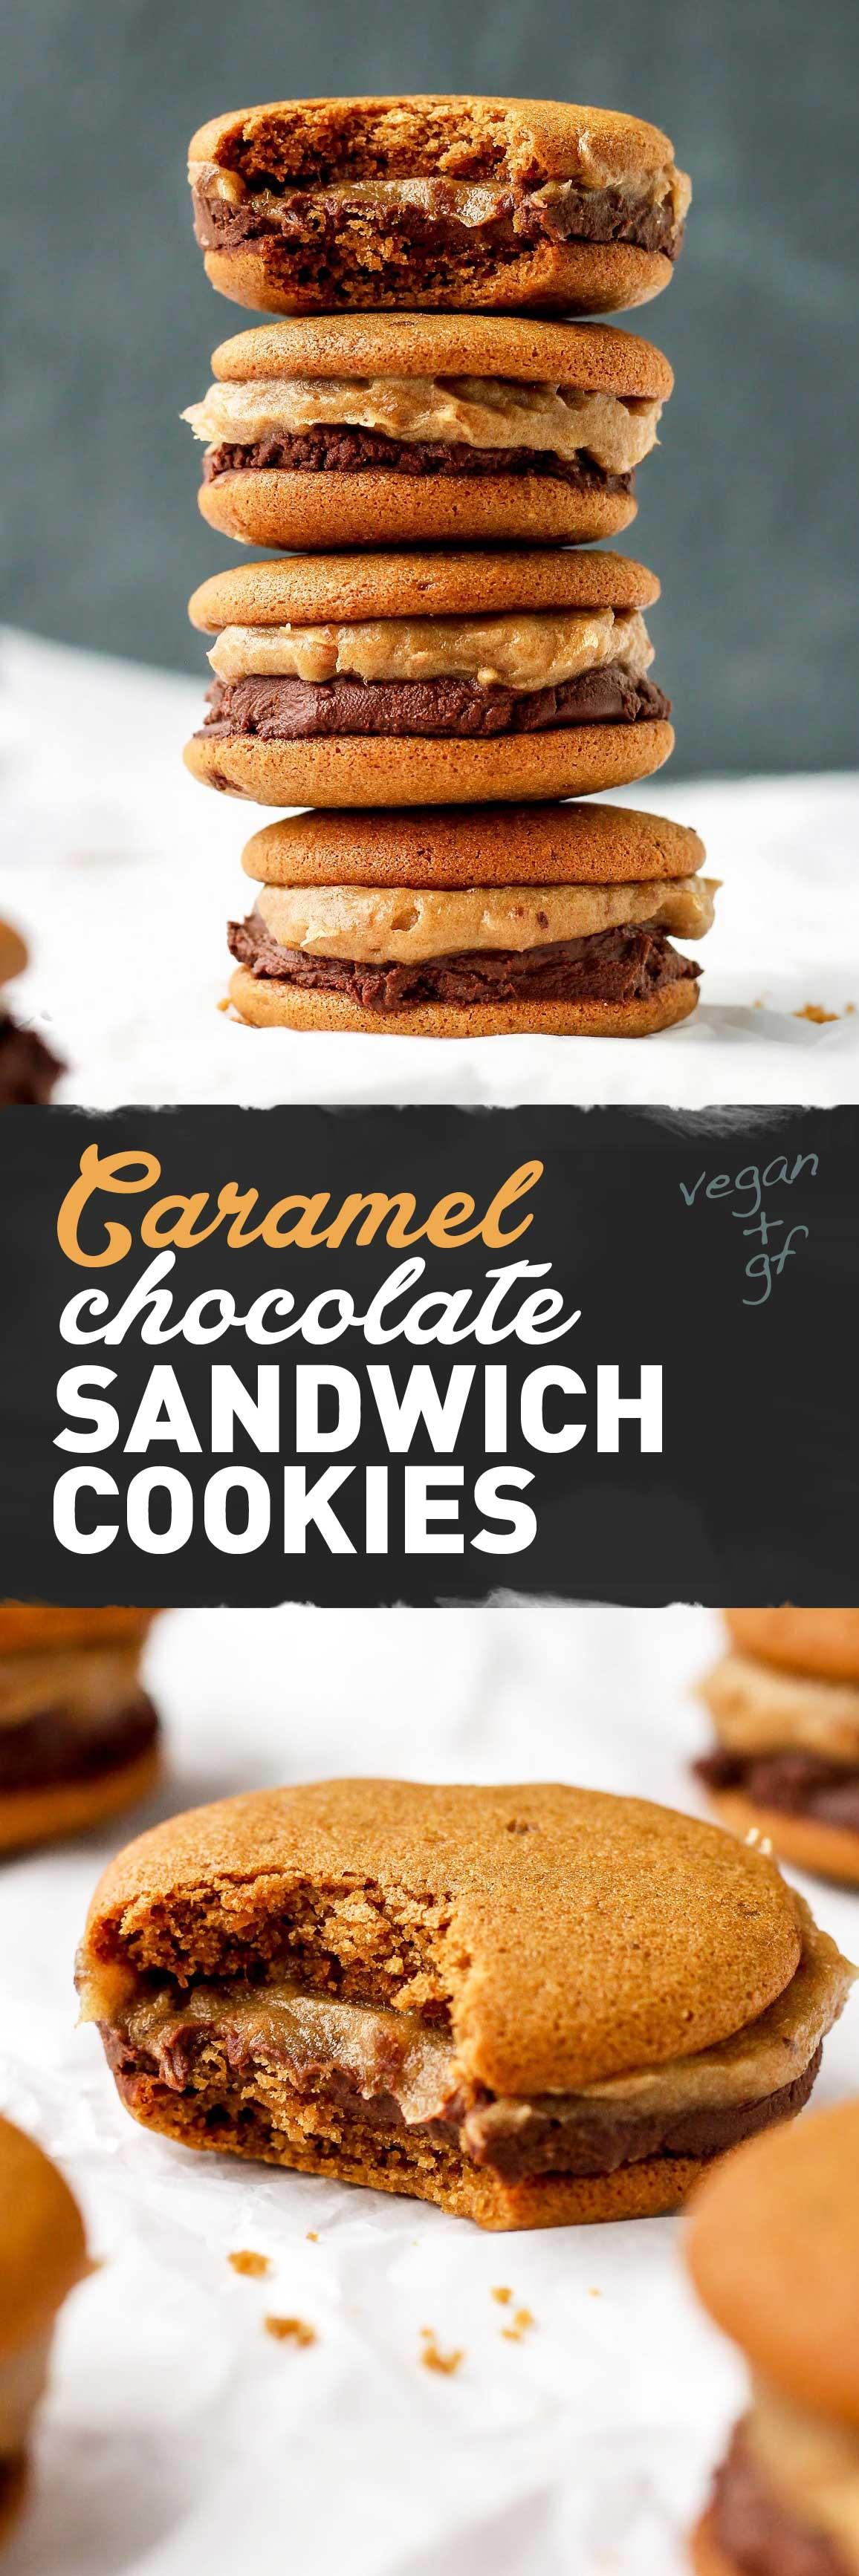 Caramel Chocolate Sandwich Cookies (Vegan + GF)